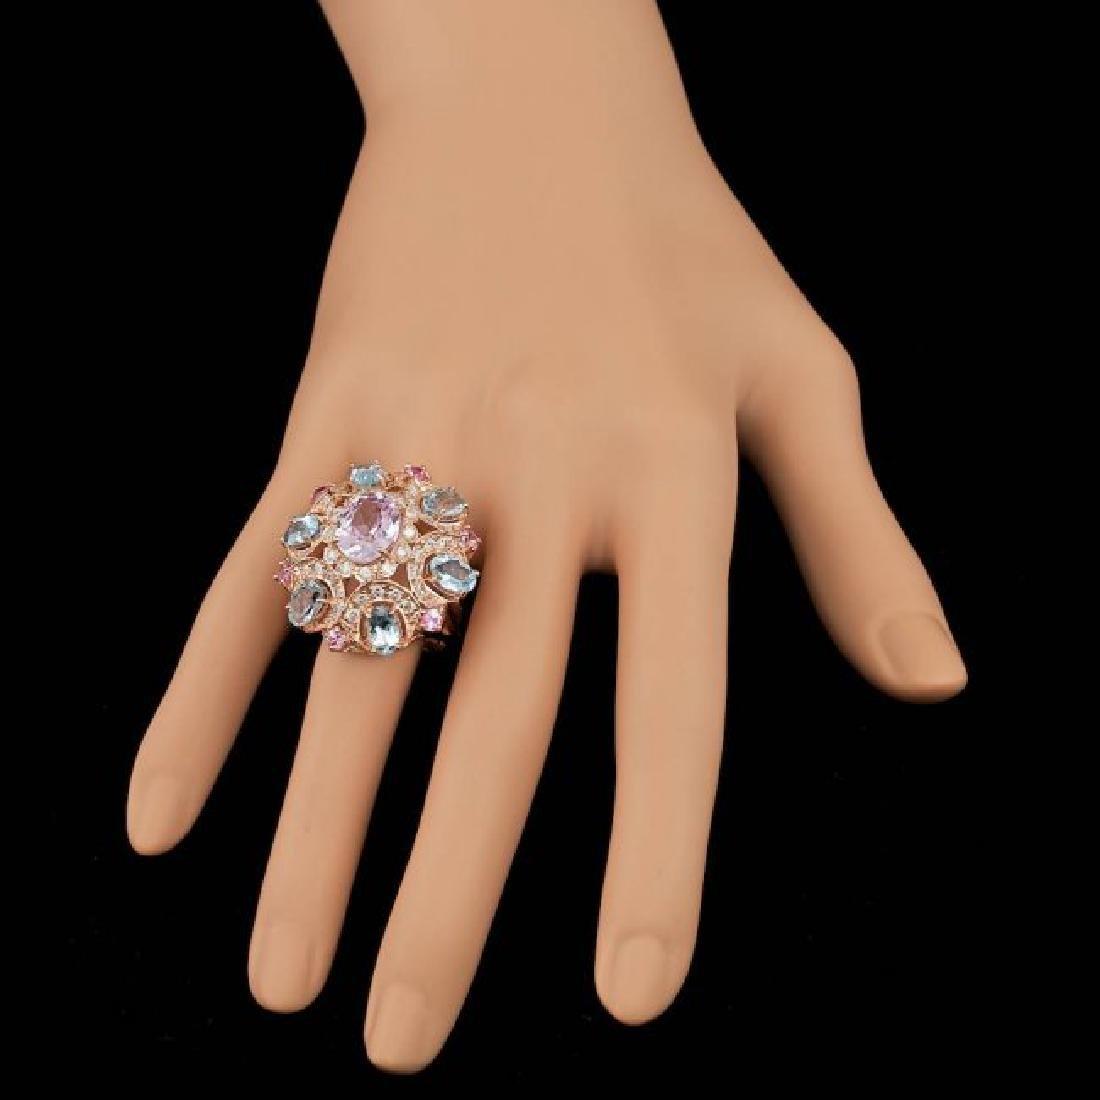 14k Rose Gold 3.50ct Kunzite 1.25ct Diamond Ring - 6